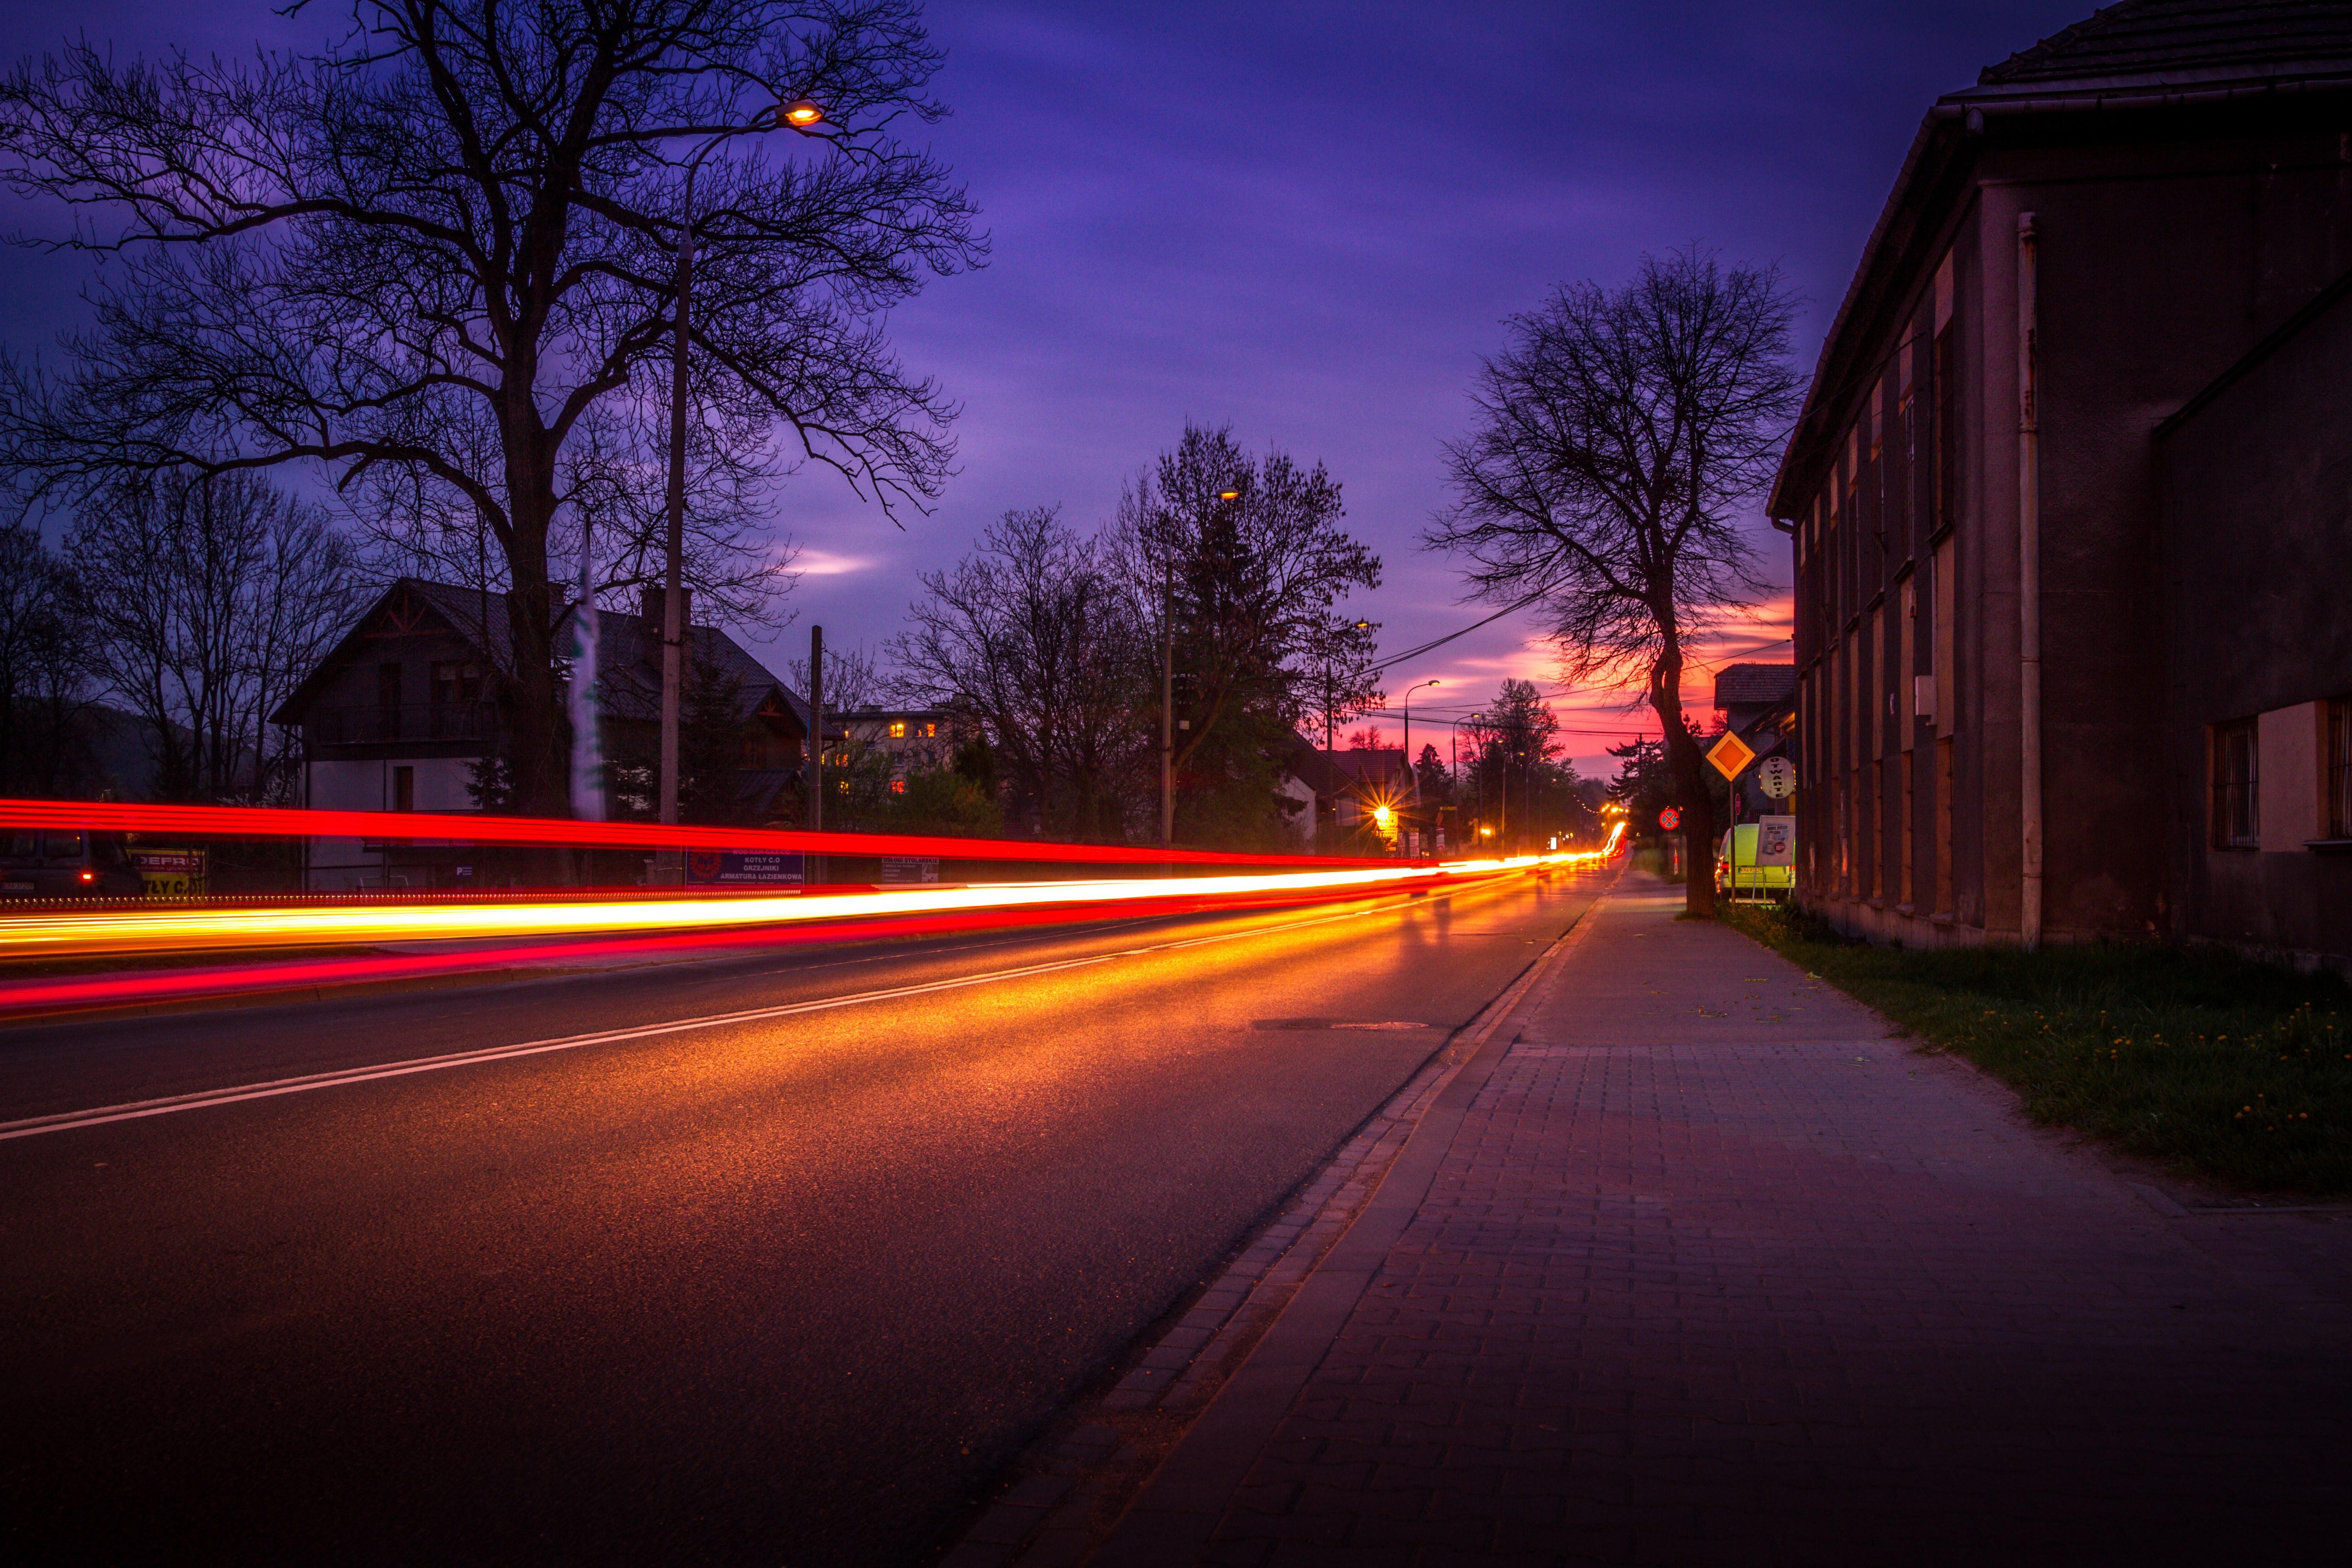 Krzeszowice by night long exposure photo, Poland, Cityscape, Dusk, Exposure, Lights, HQ Photo